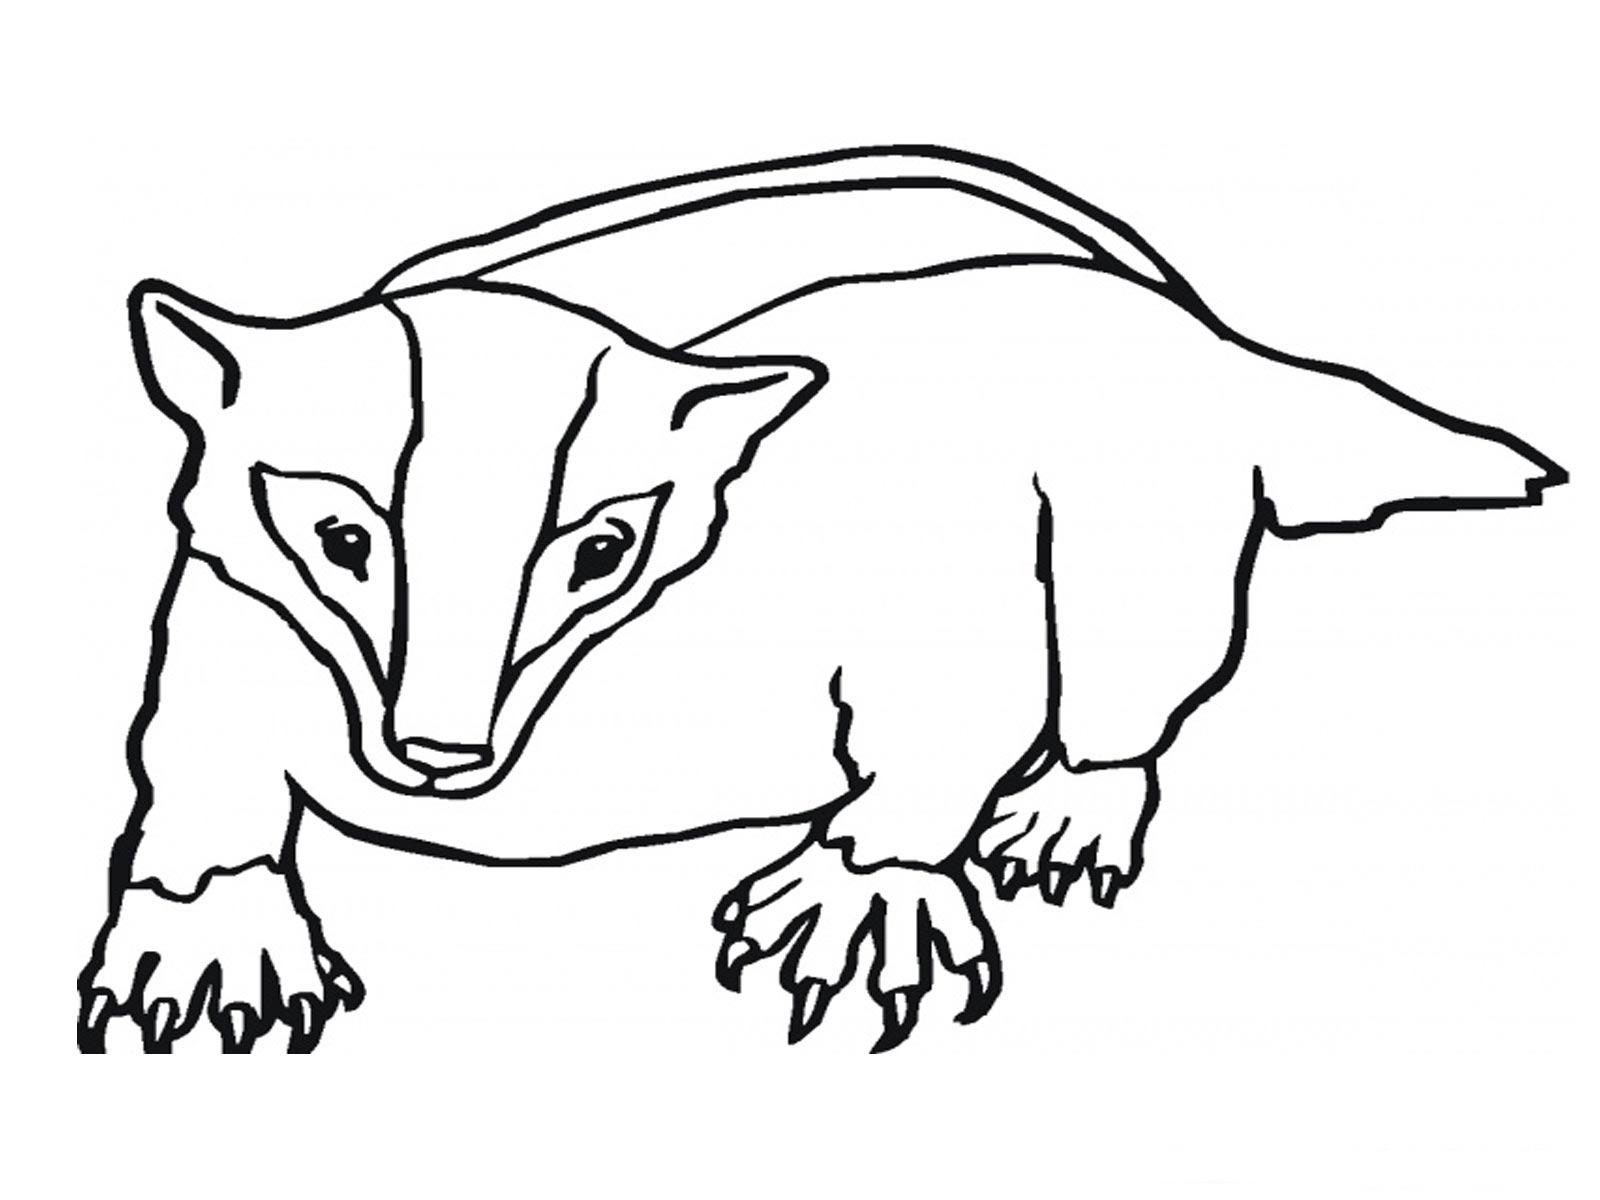 Badger clipart badger face, Badger badger face Transparent.